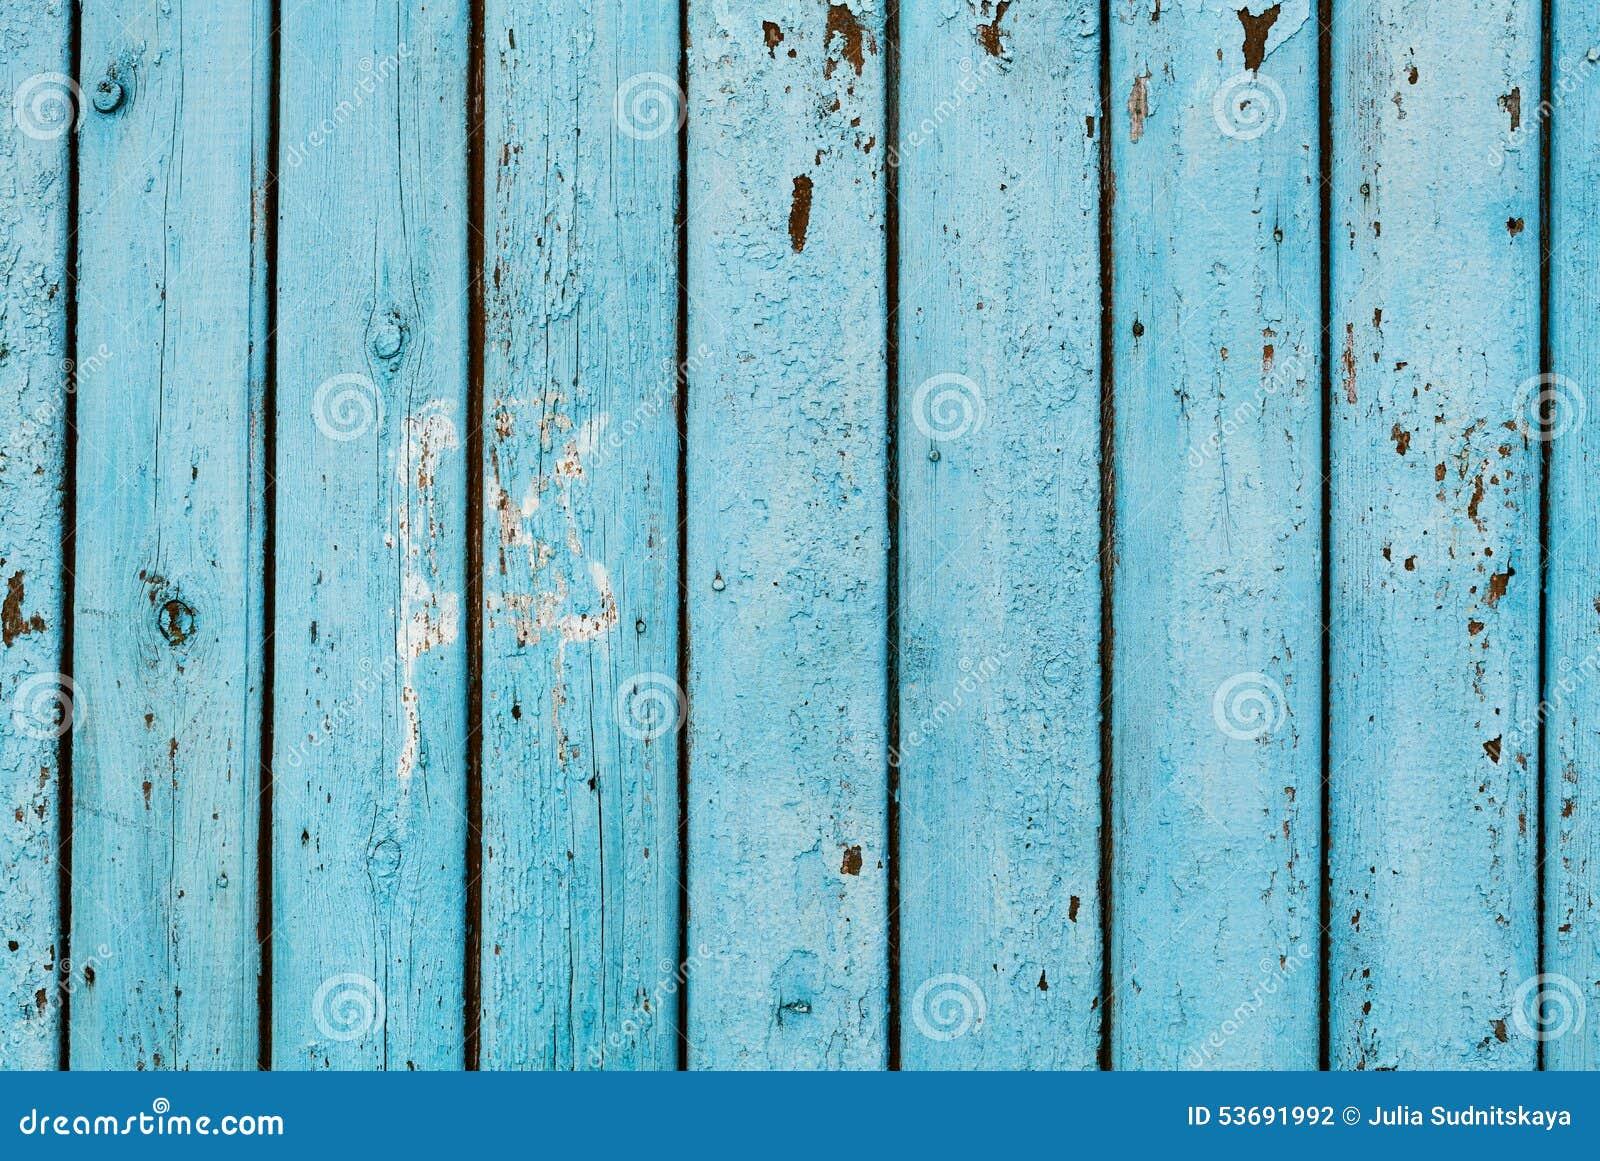 vintage blue wood background - photo #35